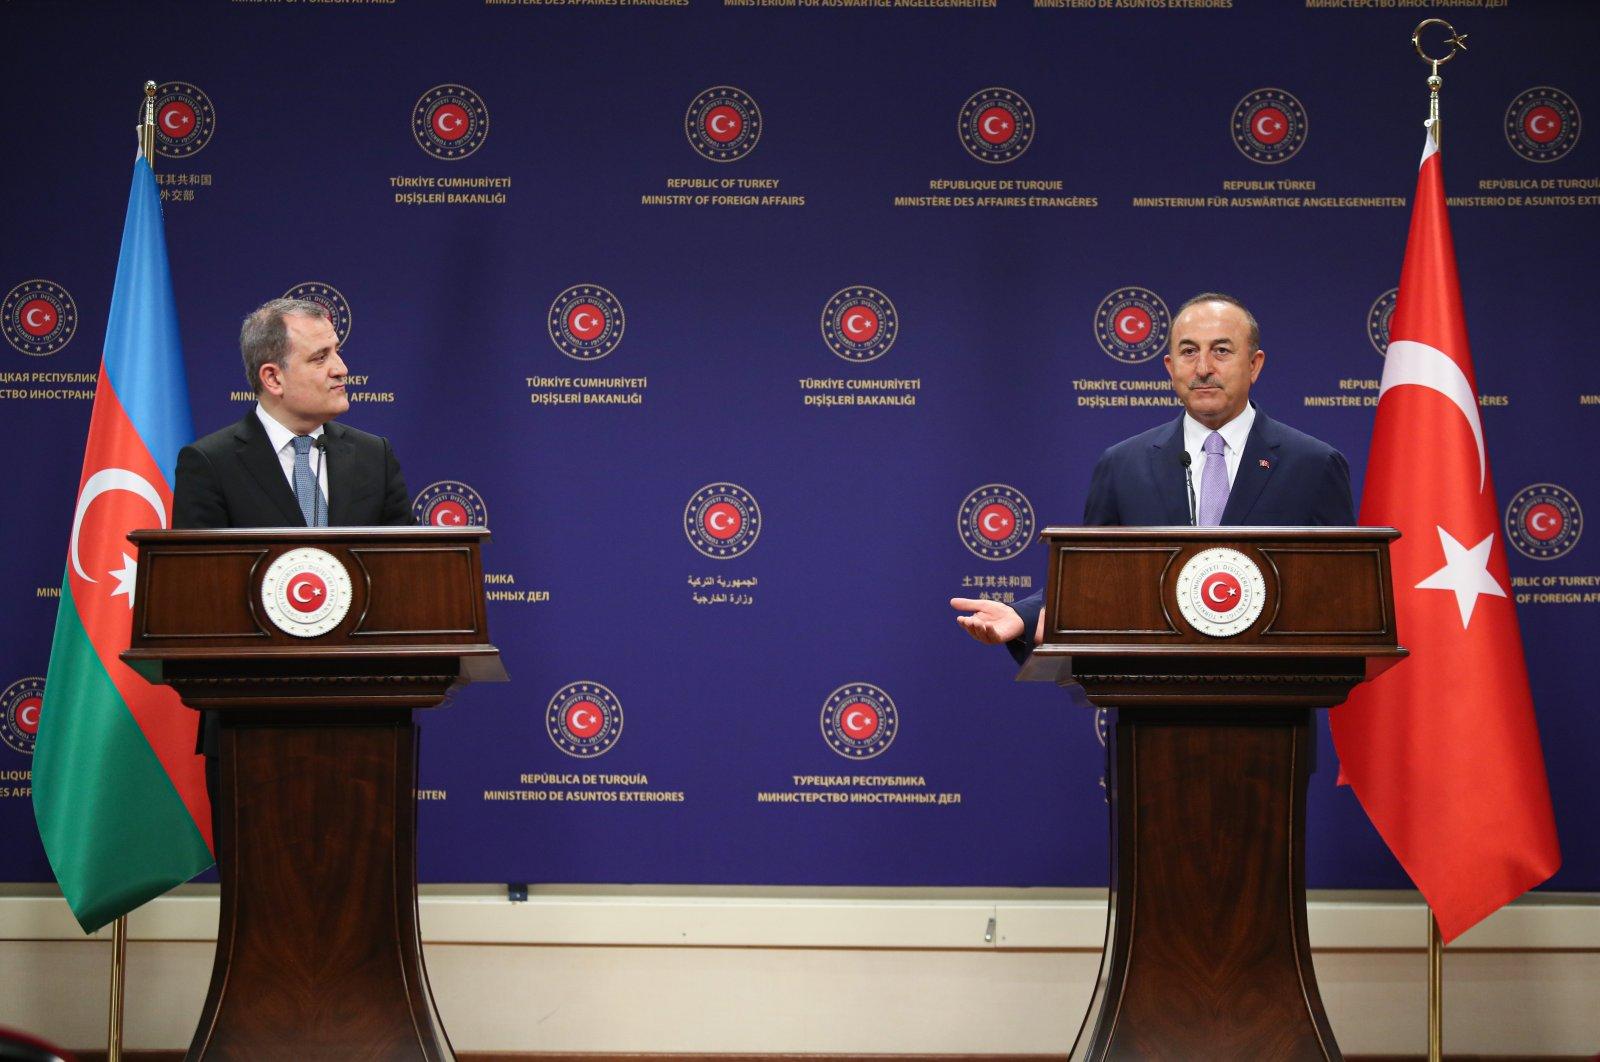 Foreign Minister Mevlüt Çavuşoğlu (R) and his Azerbaijani counterpart Jeyhun Bayramov during a joint press conference in the capital Ankara, Turkey, Aug. 12, 2020. (AA Photo)